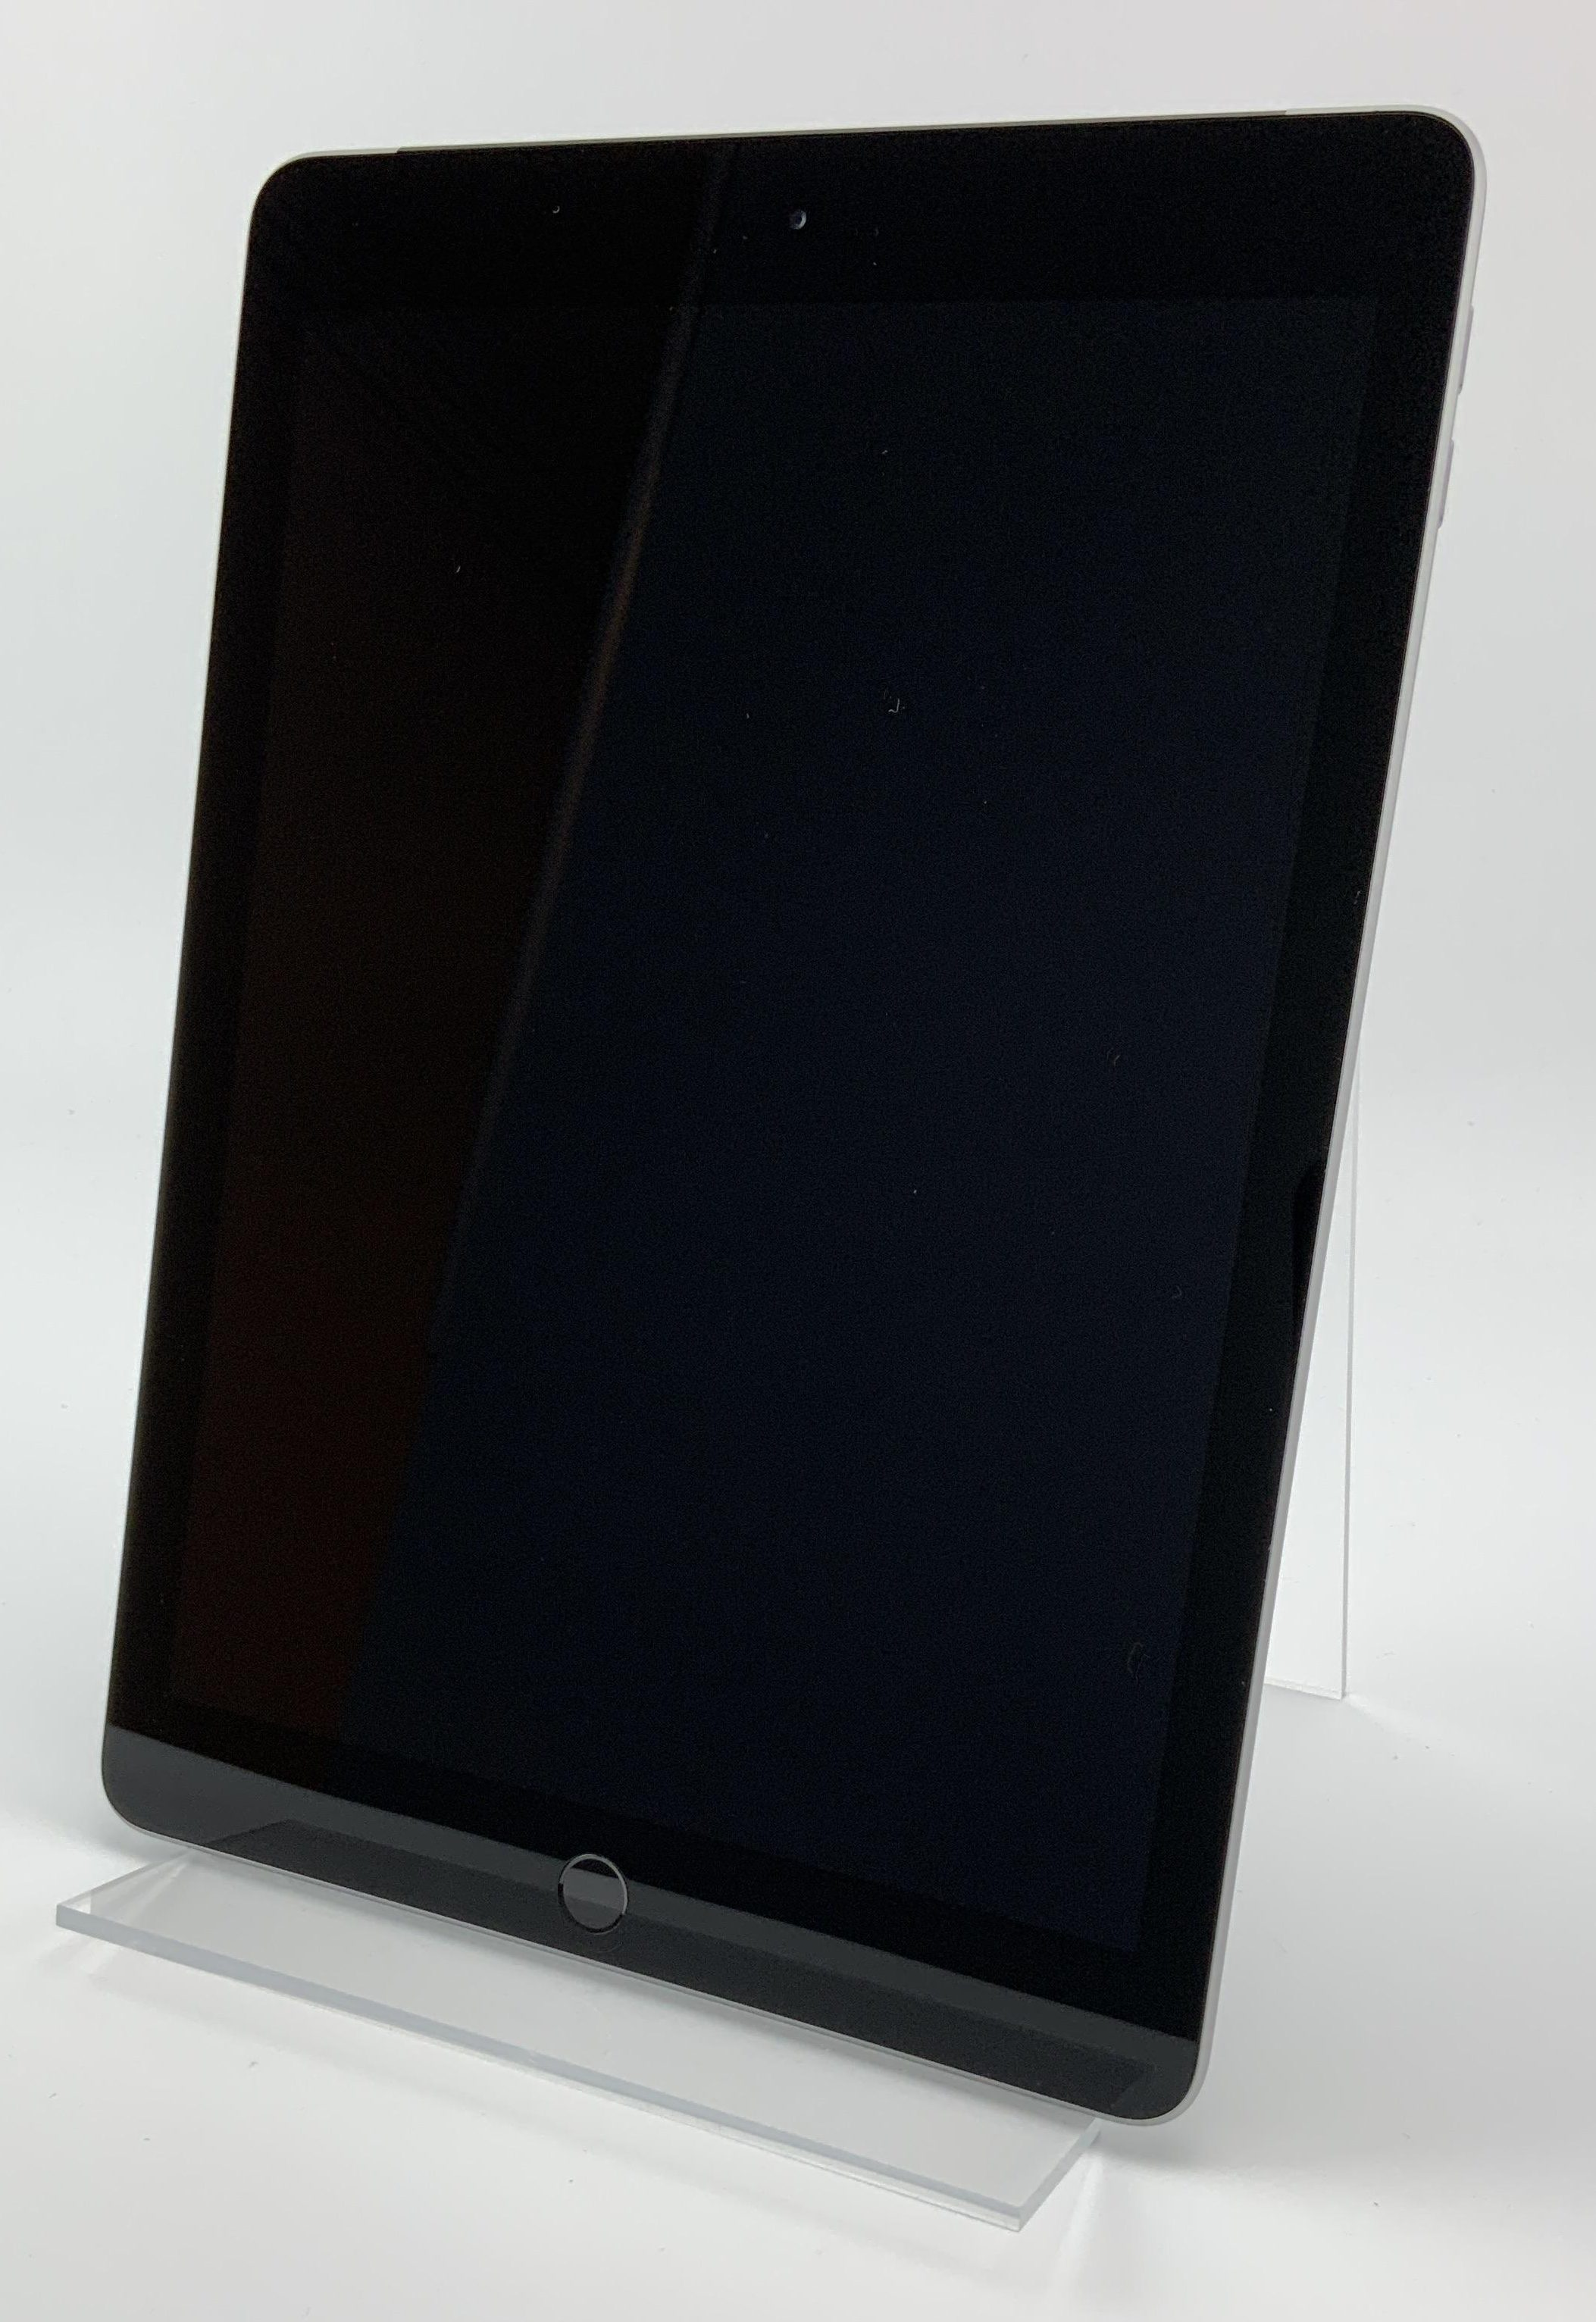 iPad 6 Wi-Fi + Cellular 128GB, 128GB, Space Gray, Bild 1